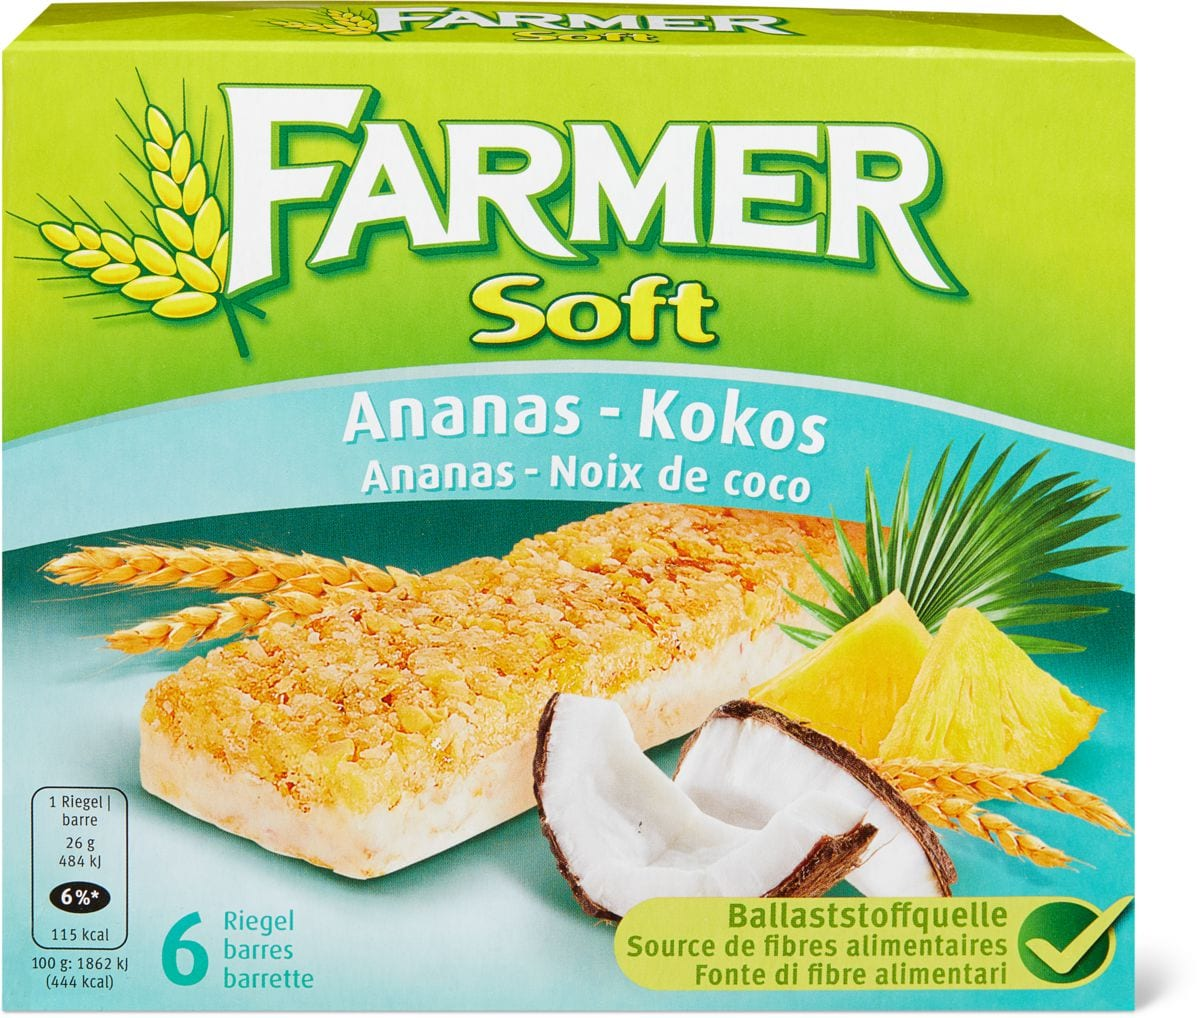 Farmer Soft Ananas-Kokos